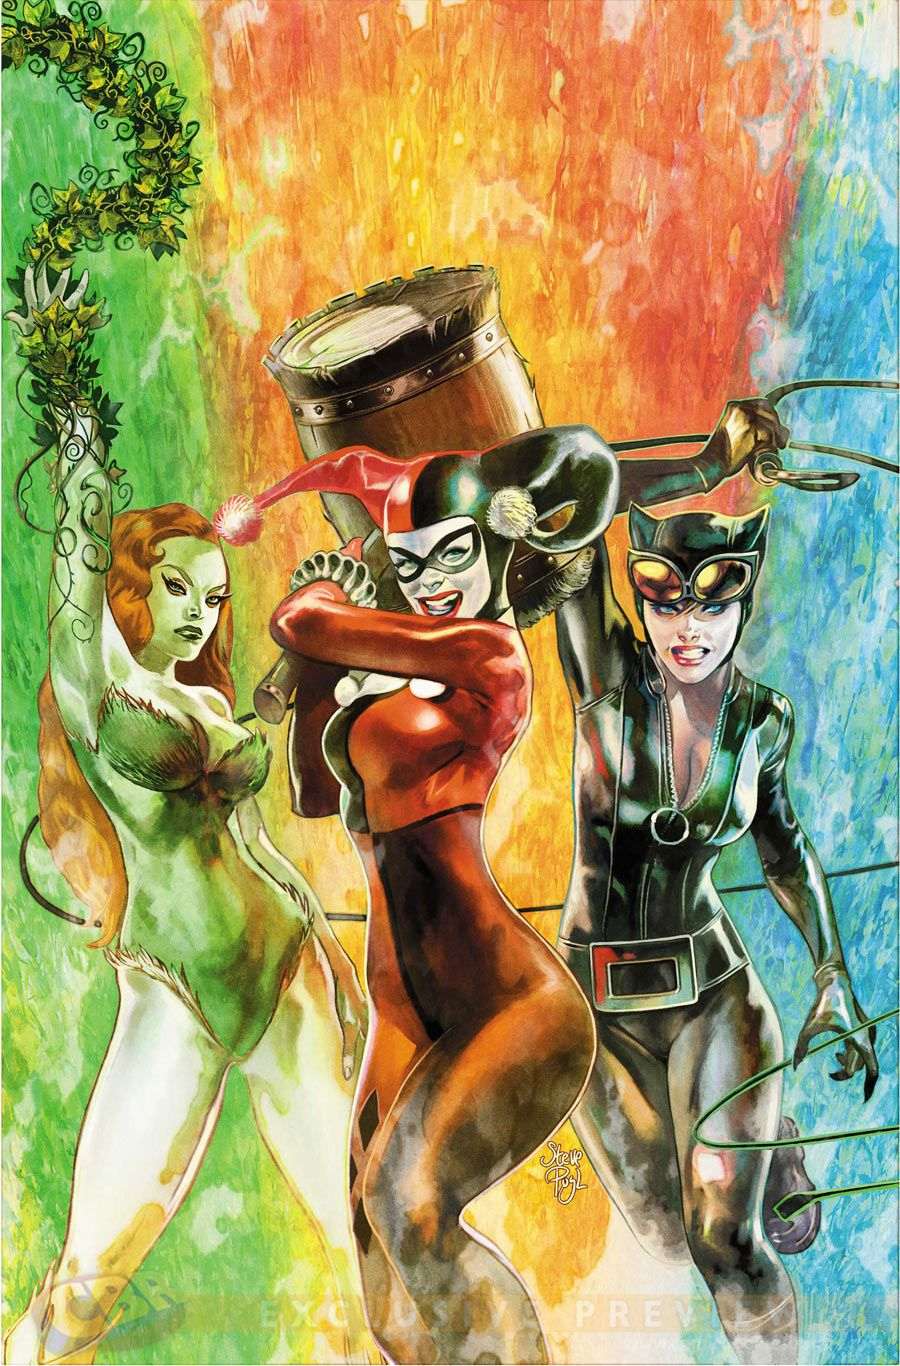 Convergence: Harley Quinn #1 - Cover by Steve Pugh